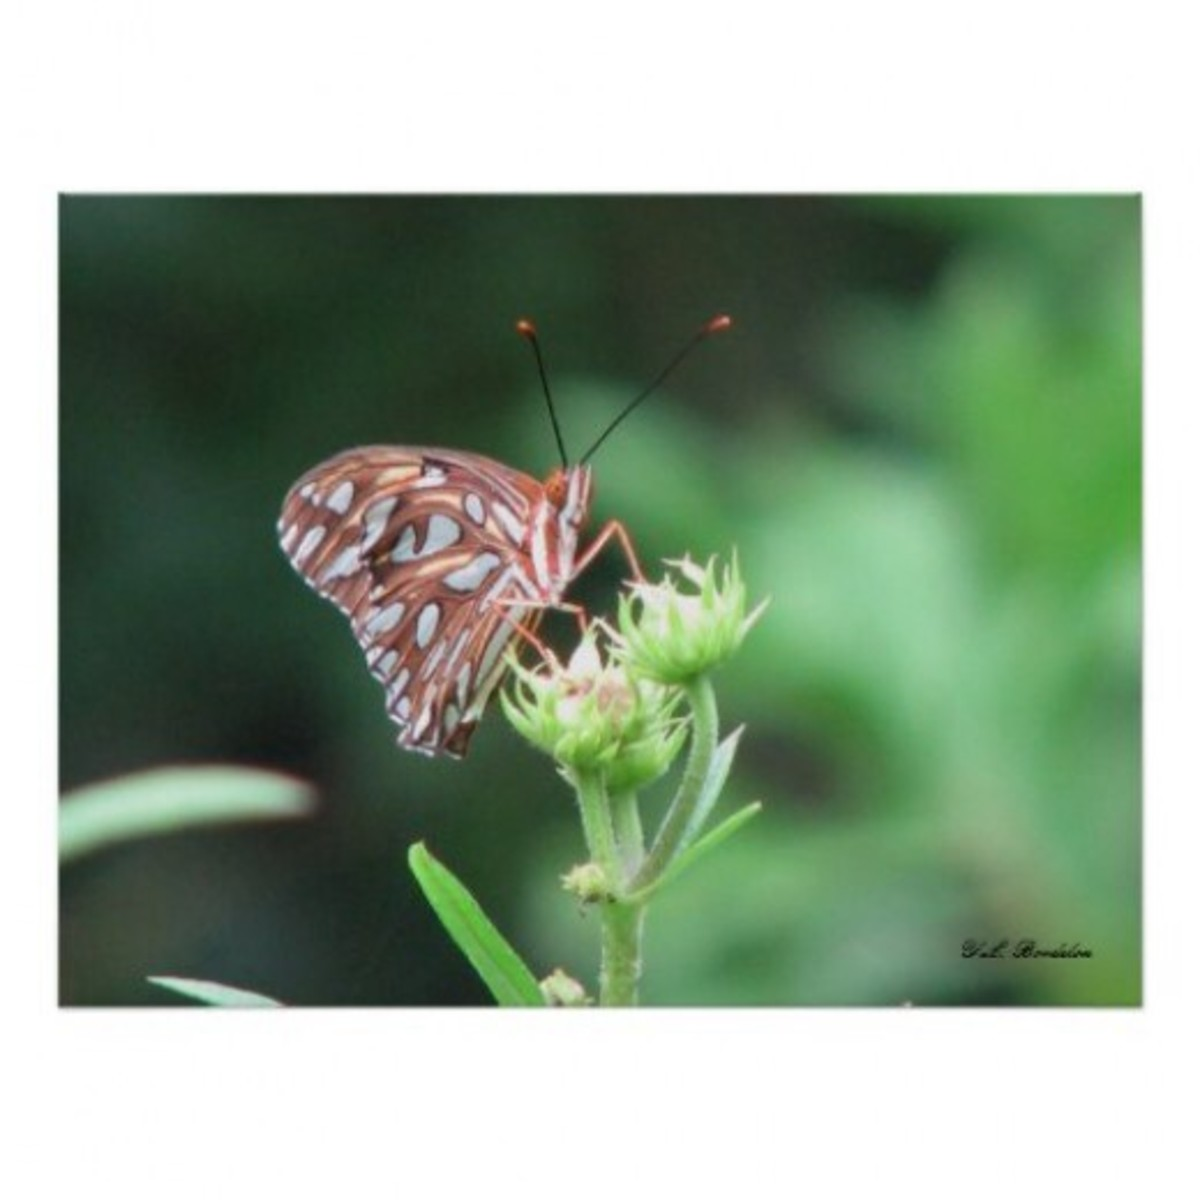 A Gulf Fritillary butterfly sits on a swamp sunflower bud.